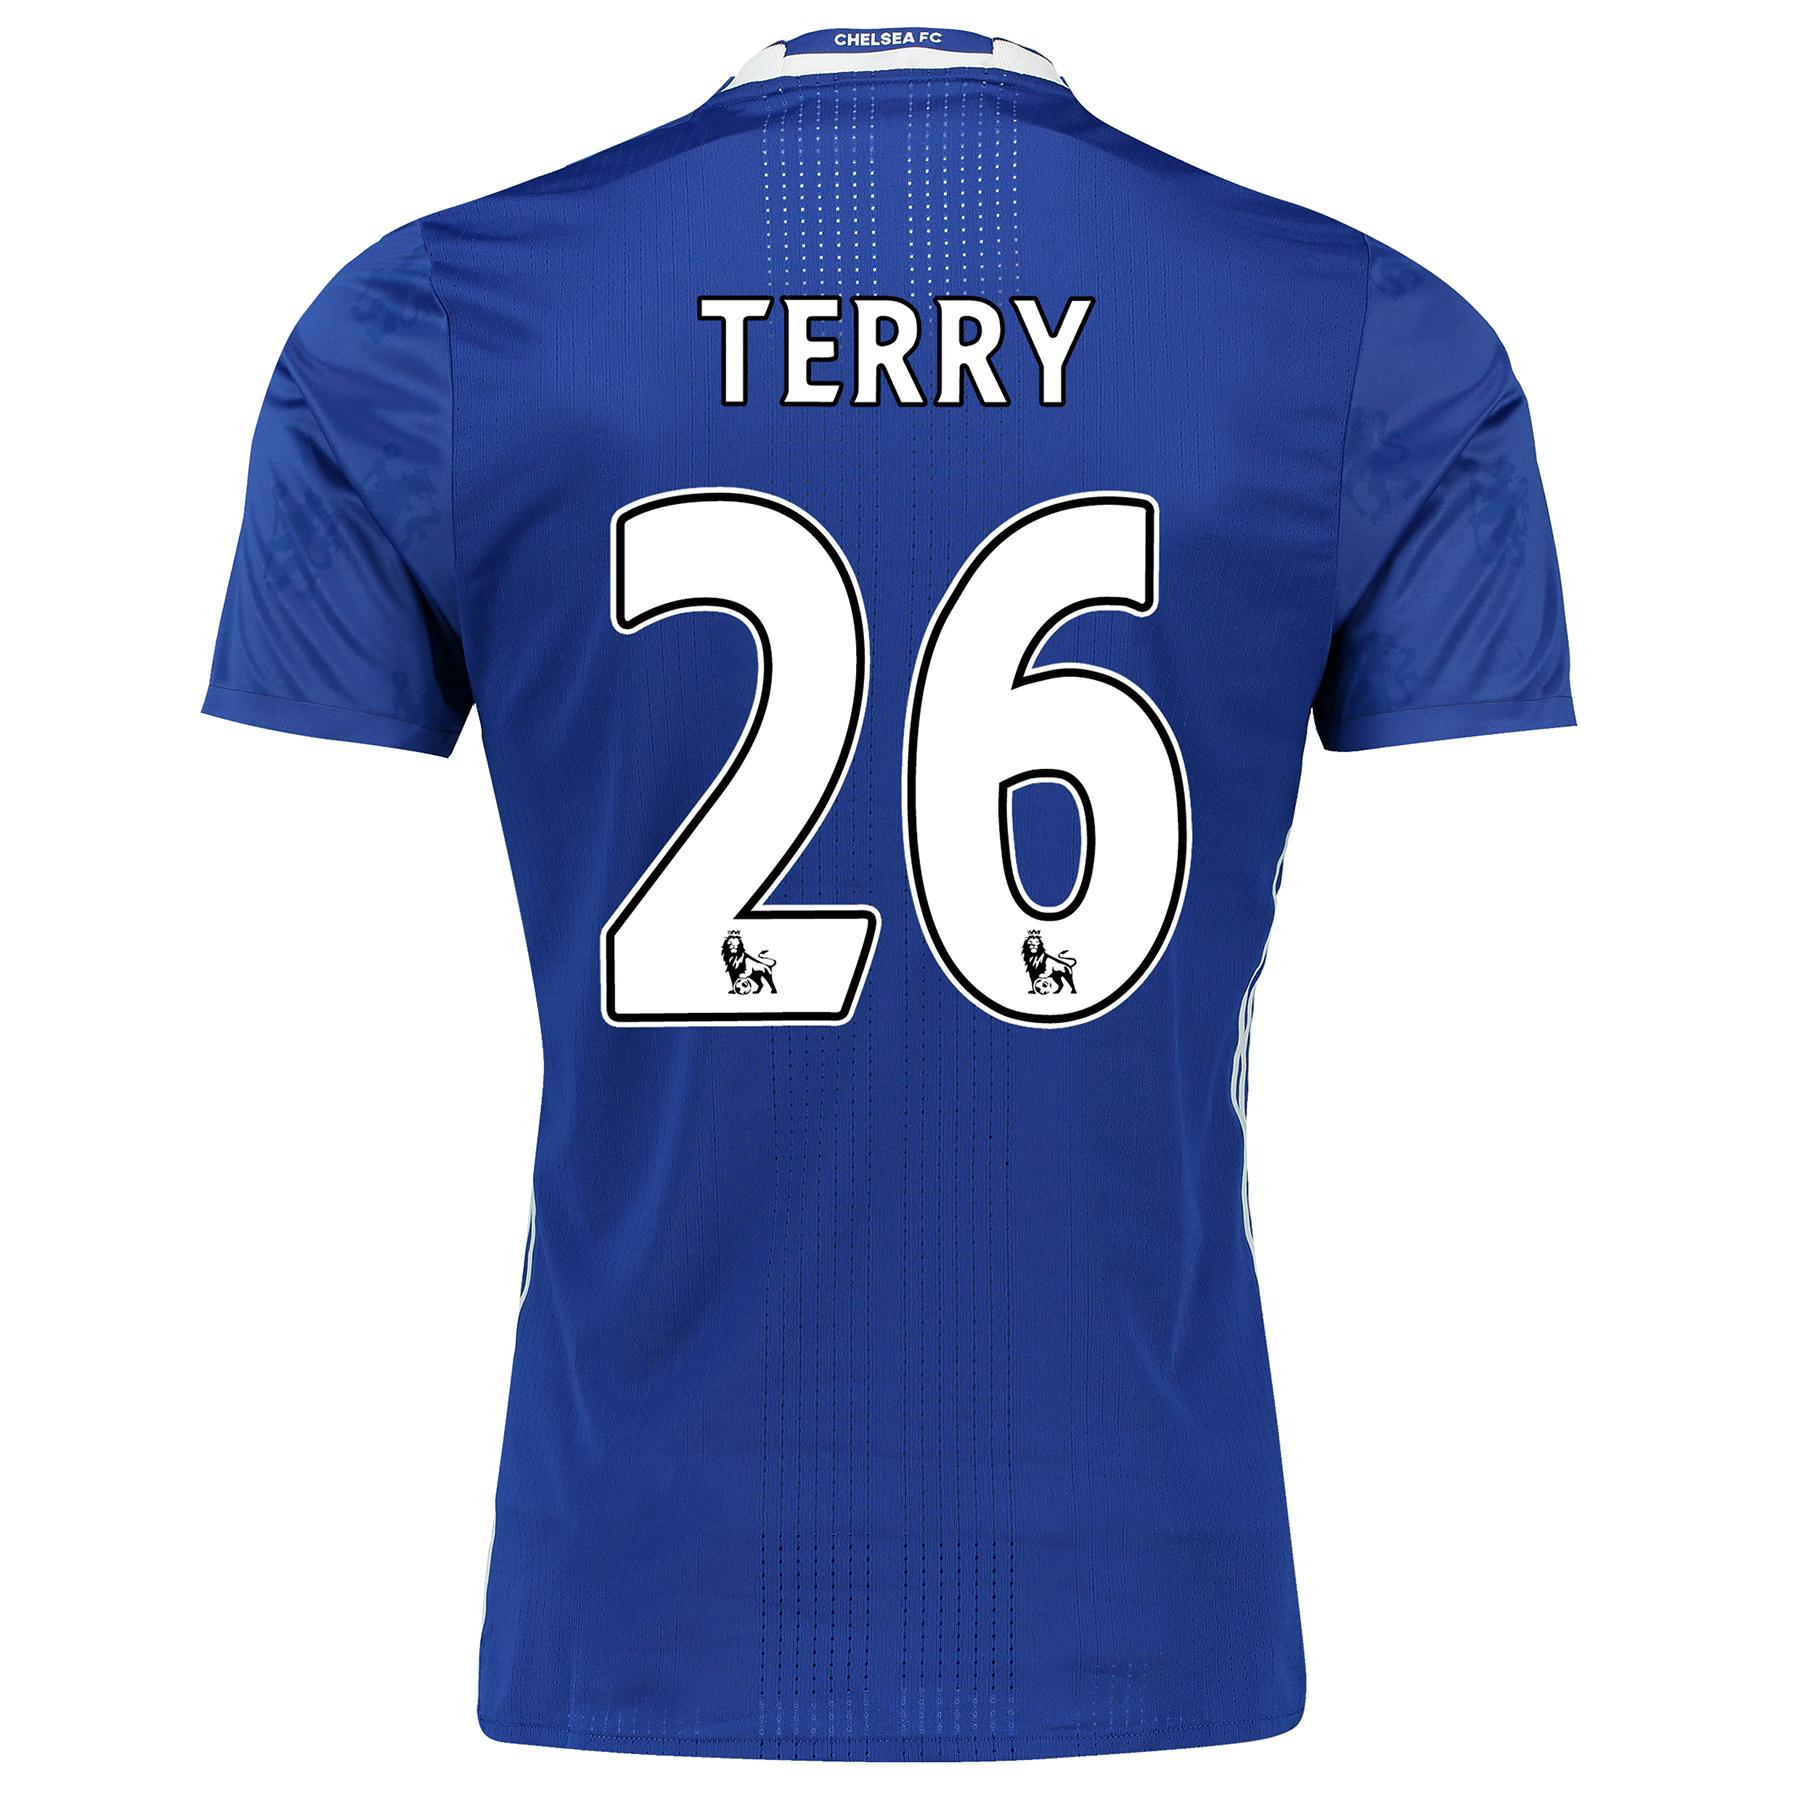 Shop Terry Printed Shirts